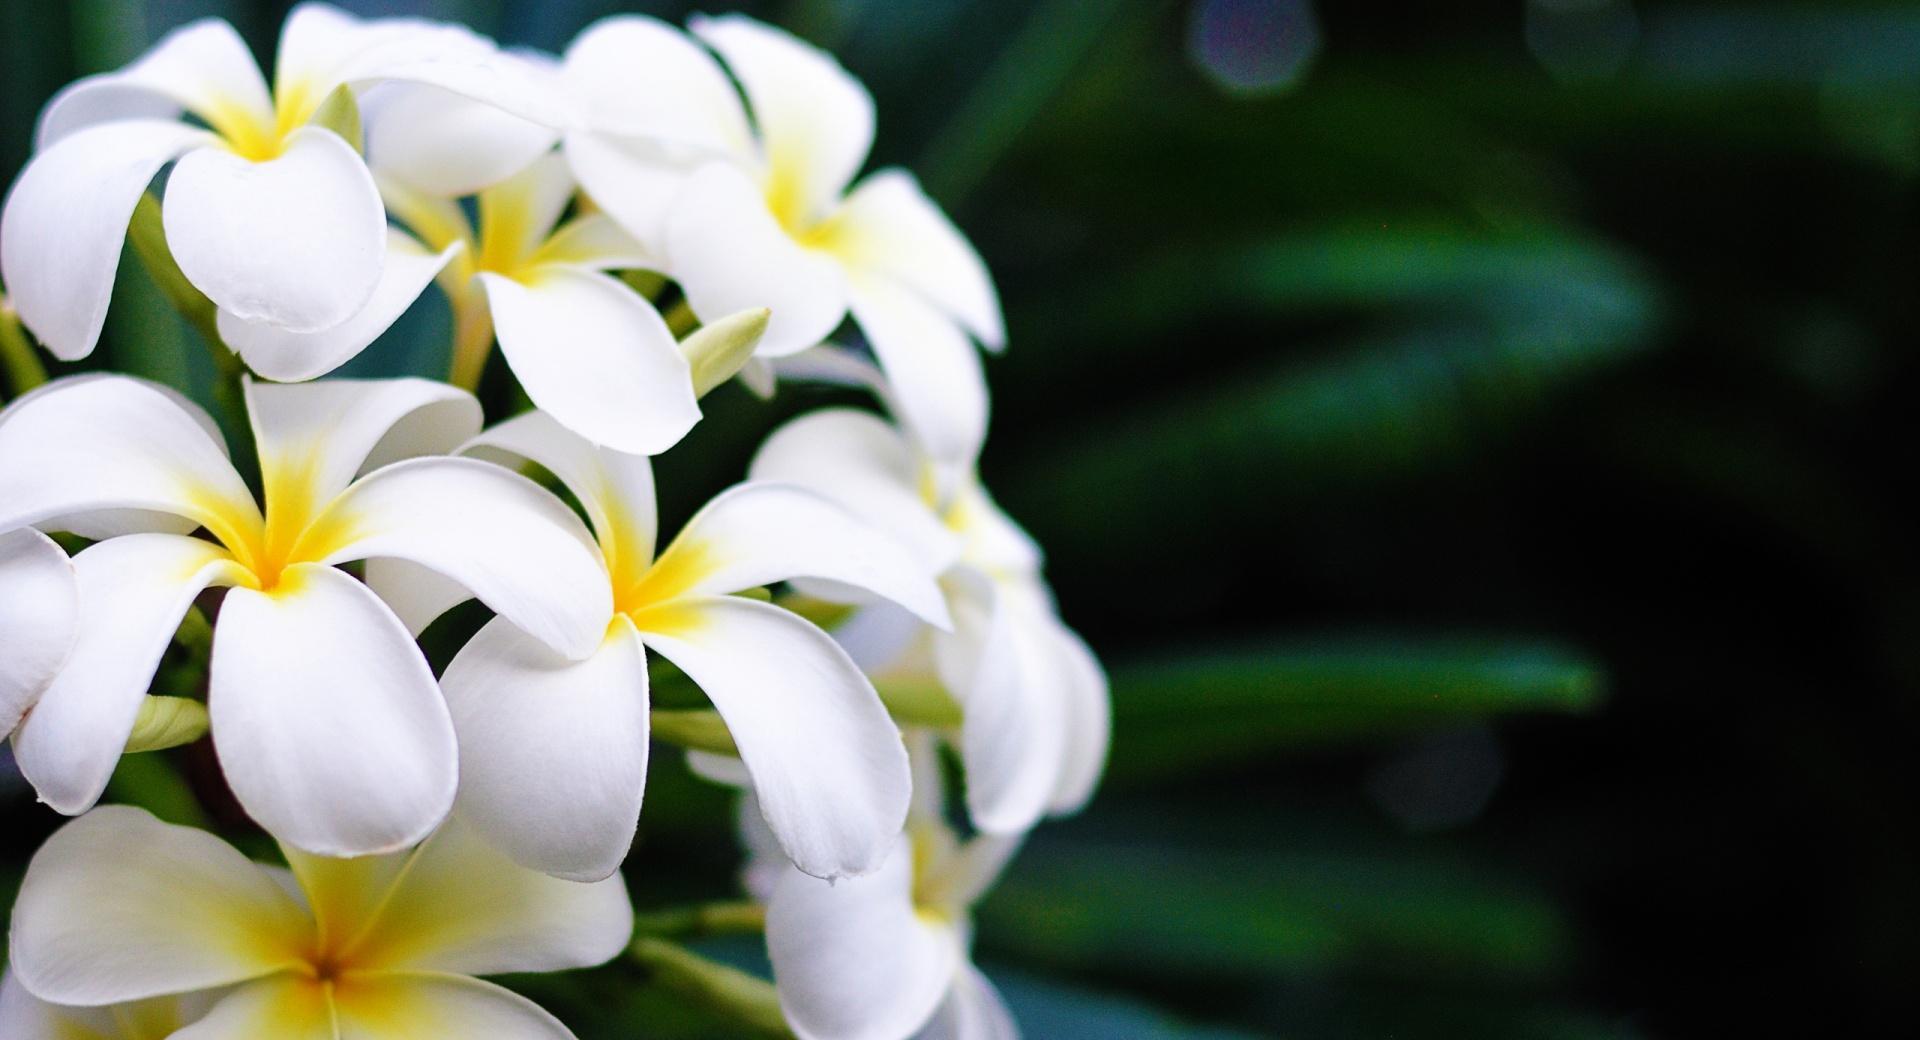 Hawaii Flowers wallpapers HD quality